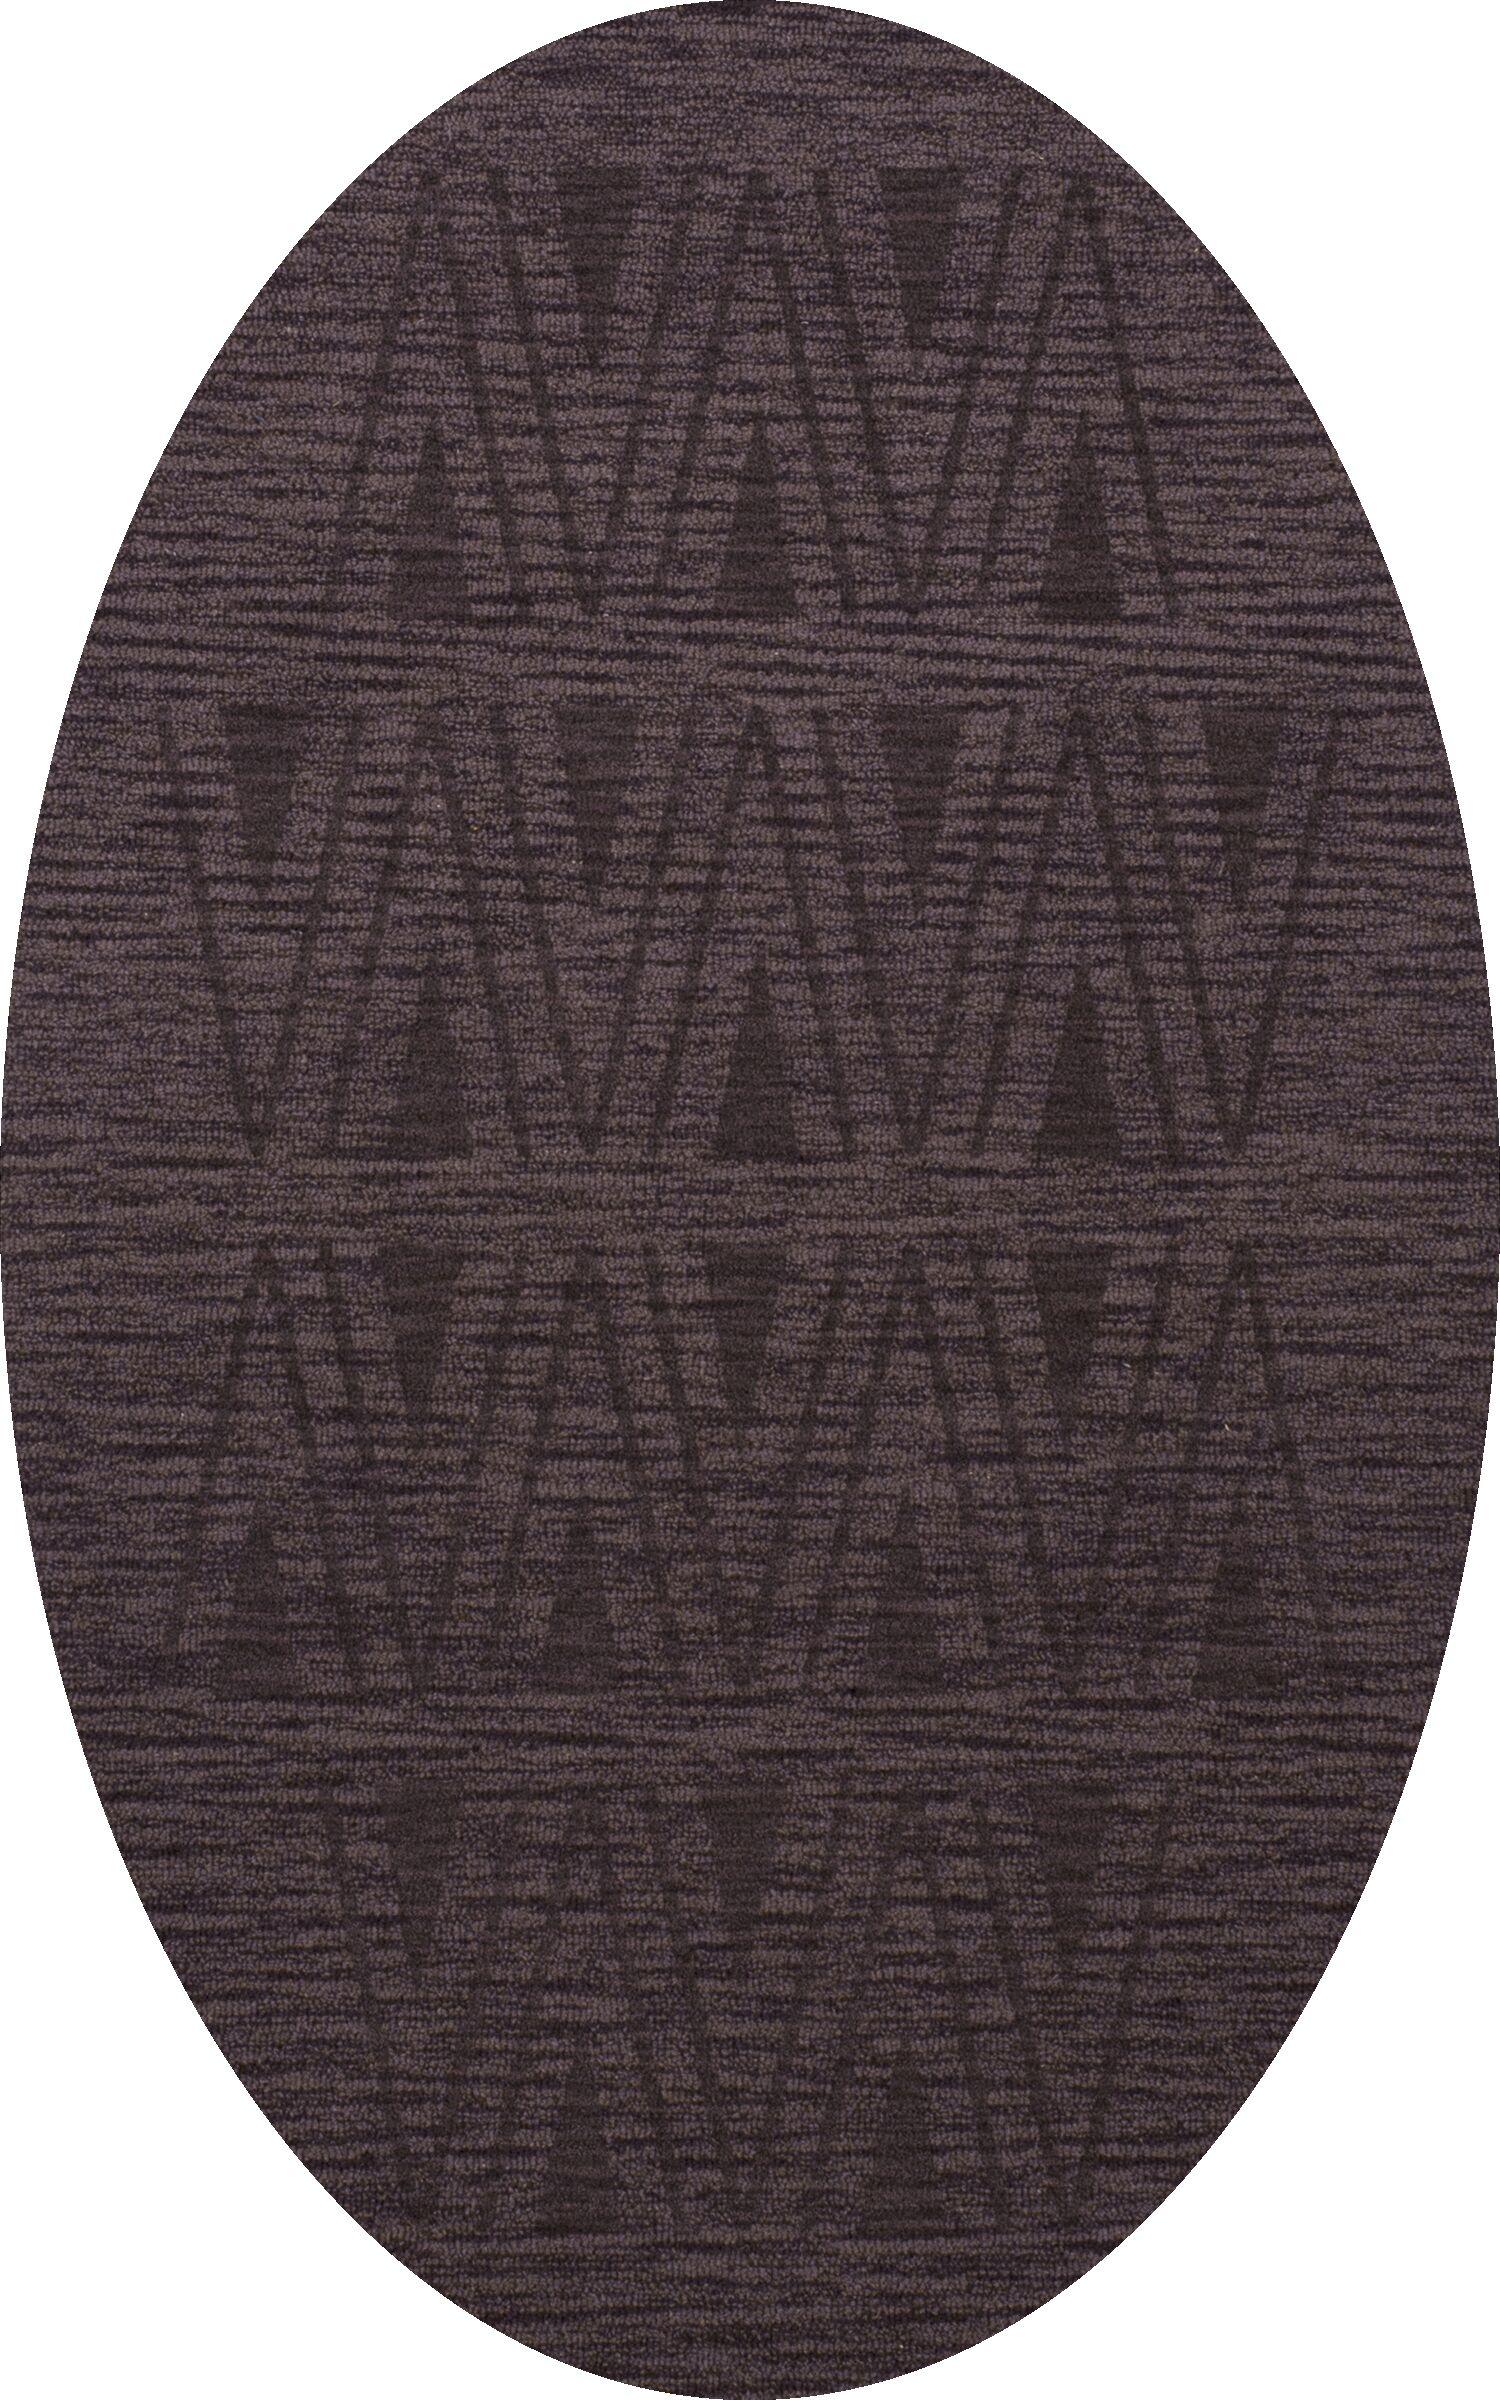 Bella Machine Woven Wool Purple Area Rug Rug Size: Oval 9' x 12'